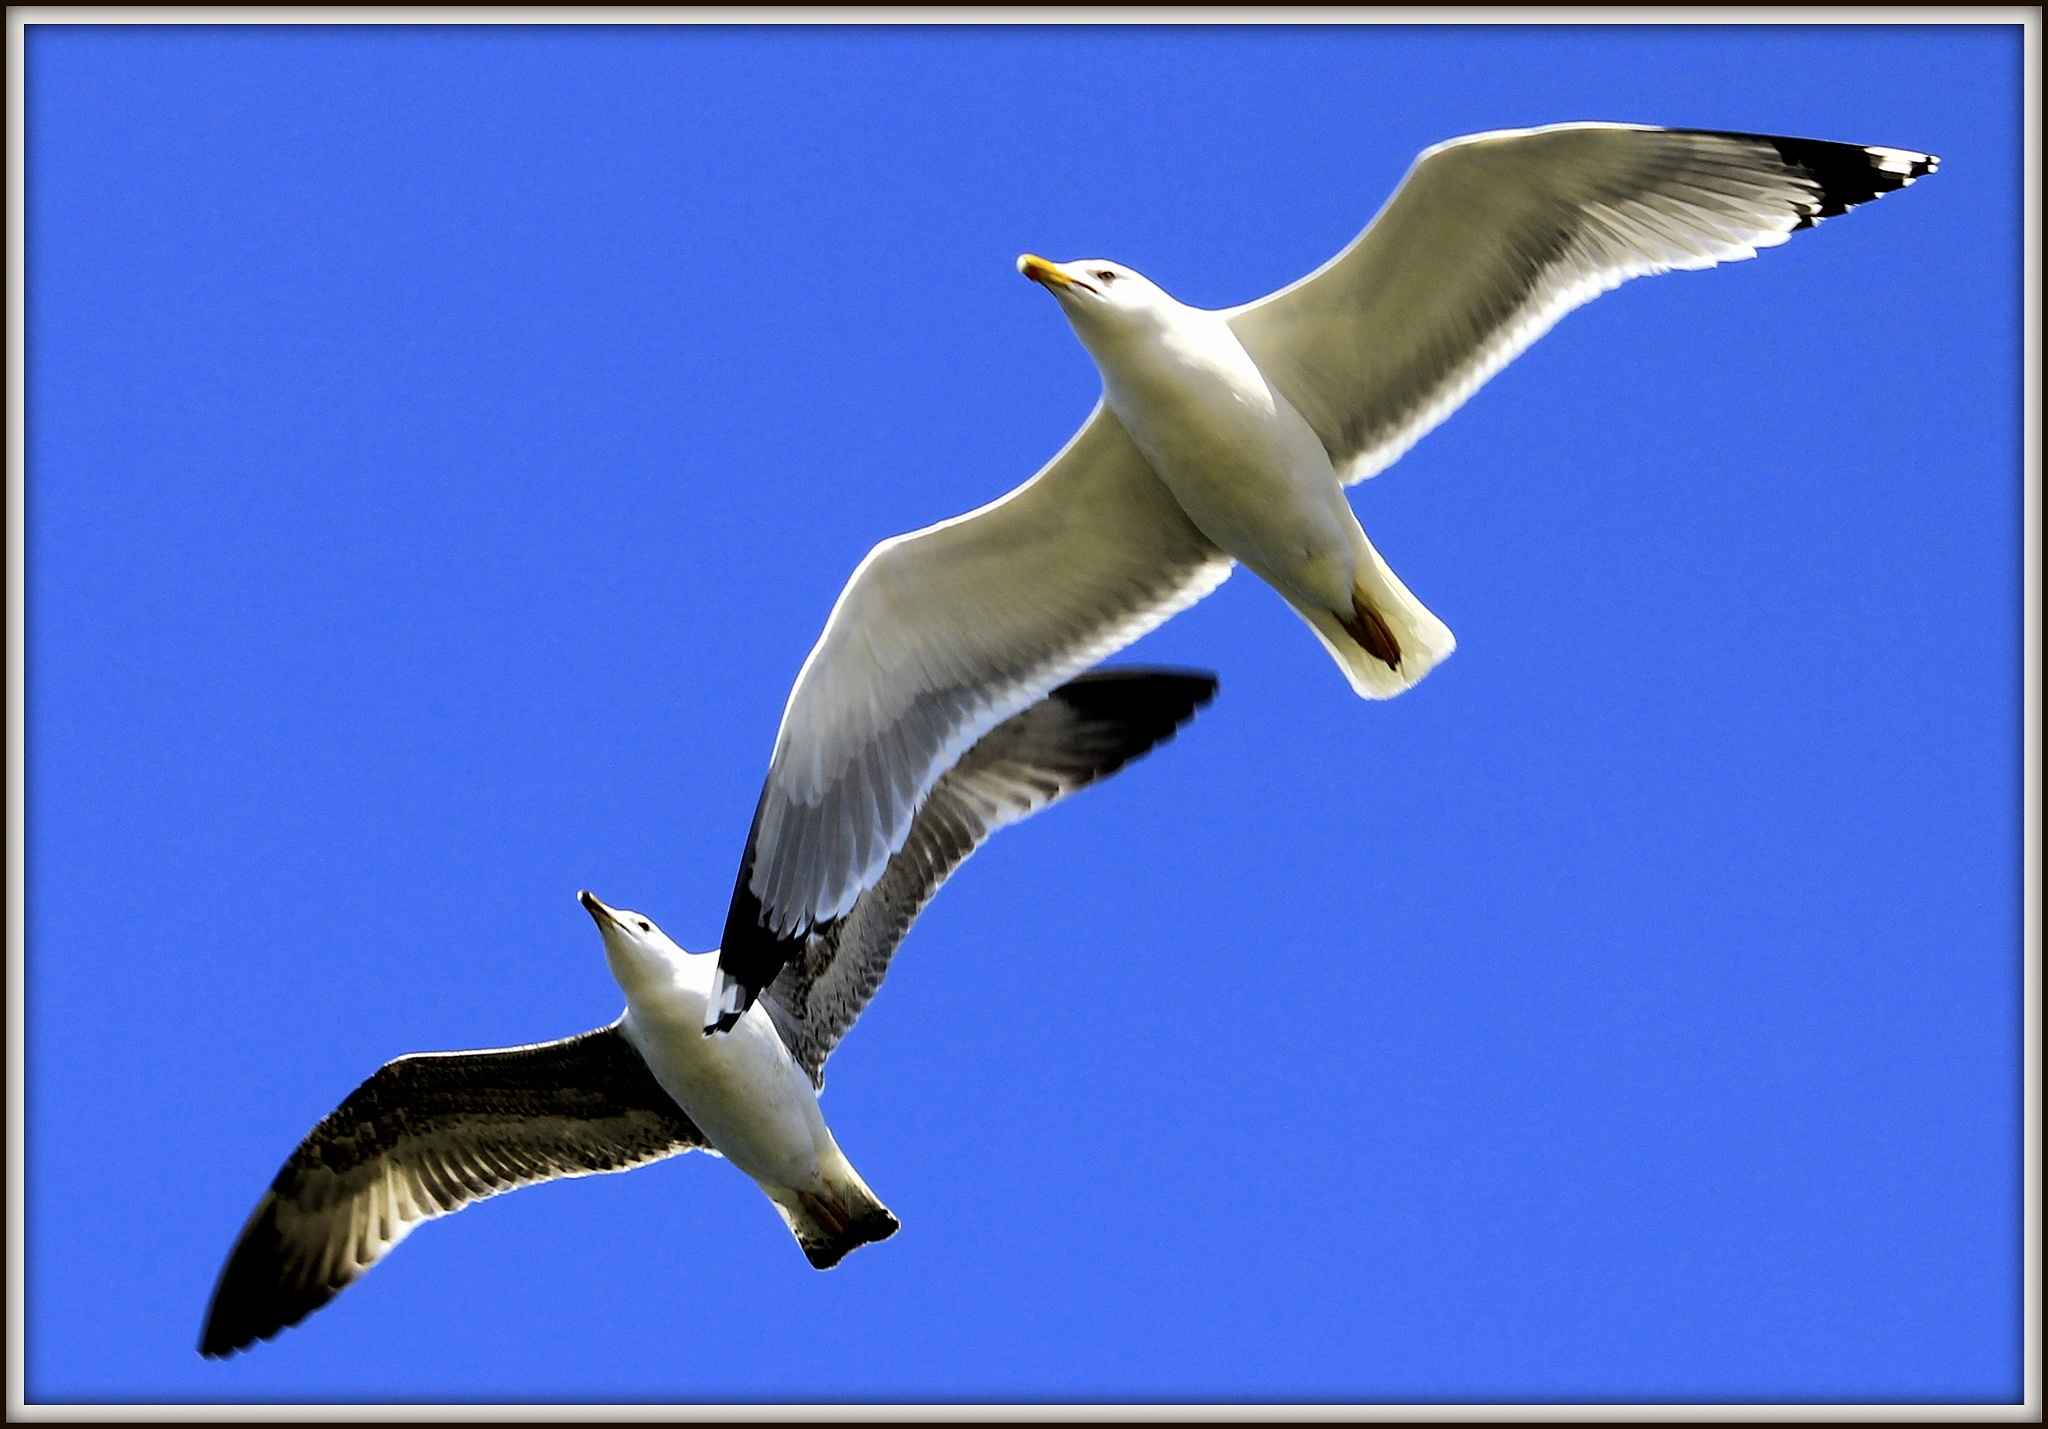 seagull by Erdoğan ORÇİN